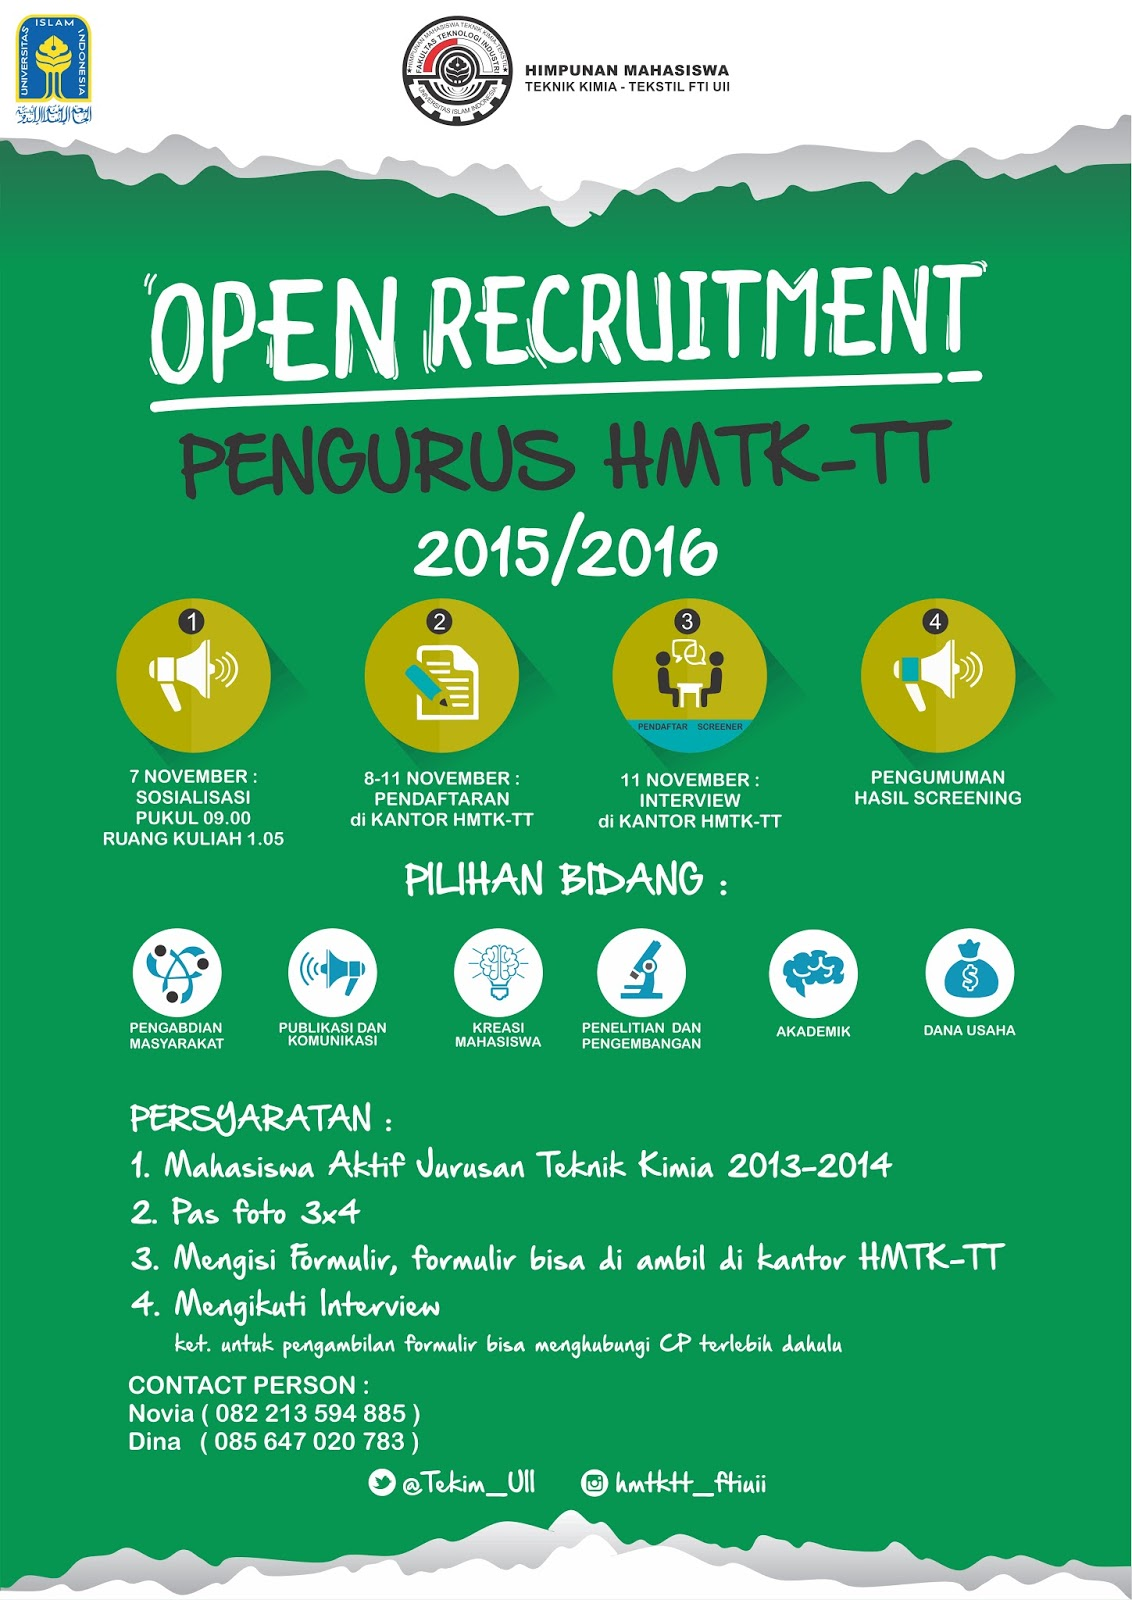 Open Recruitment Pengurus Hmtktt 2015 2016 Hmtk Tt Fti Uii